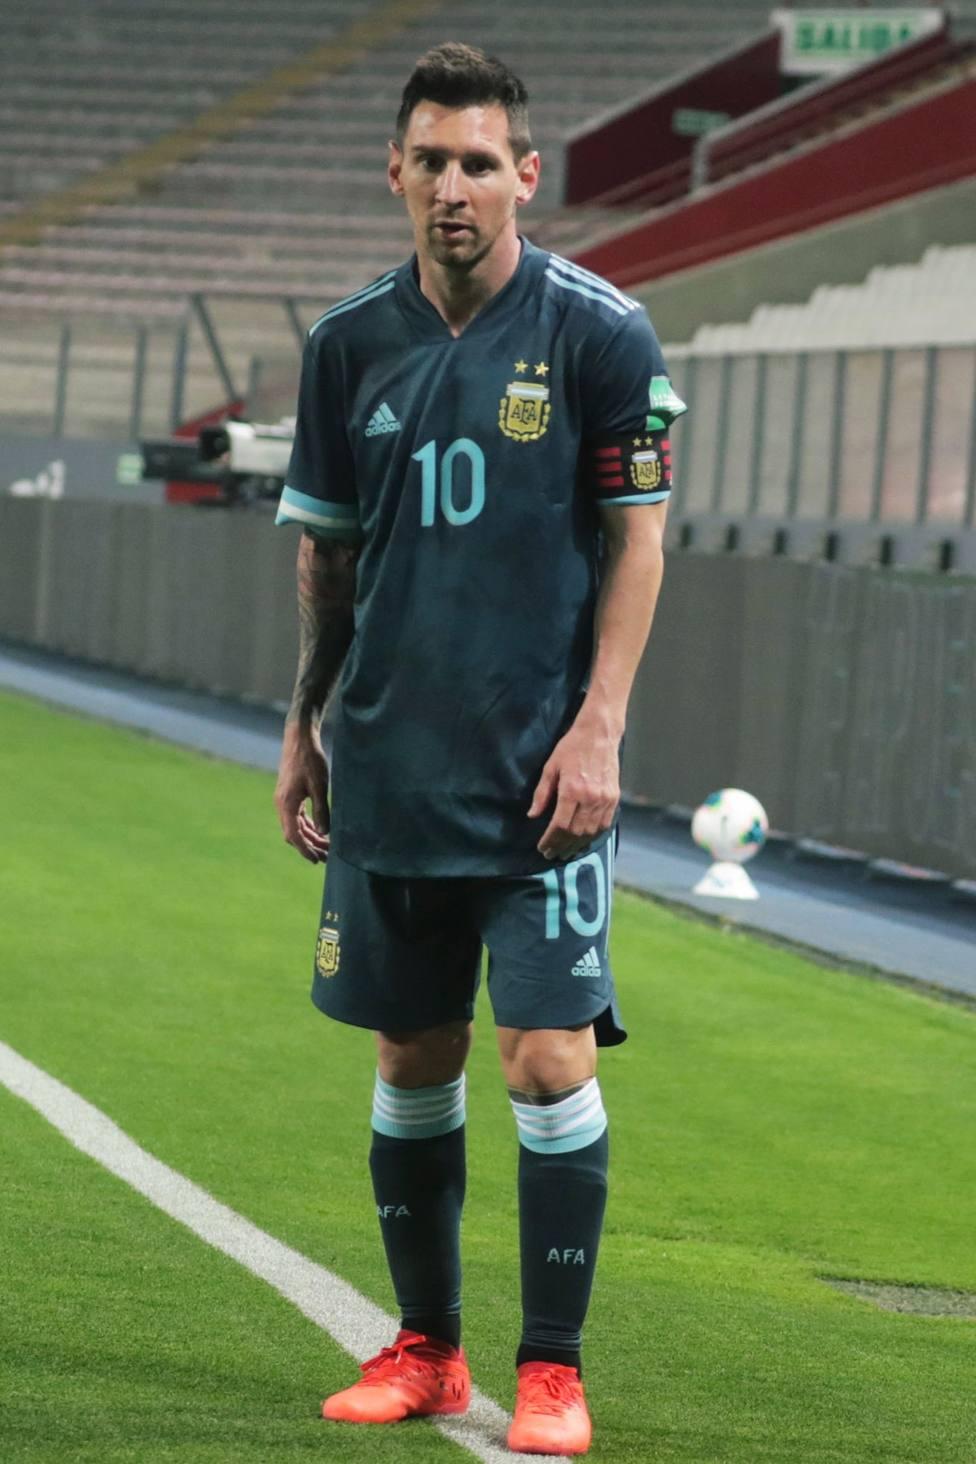 Messi: Me veo capacitado para seguir ayudando a este grupo